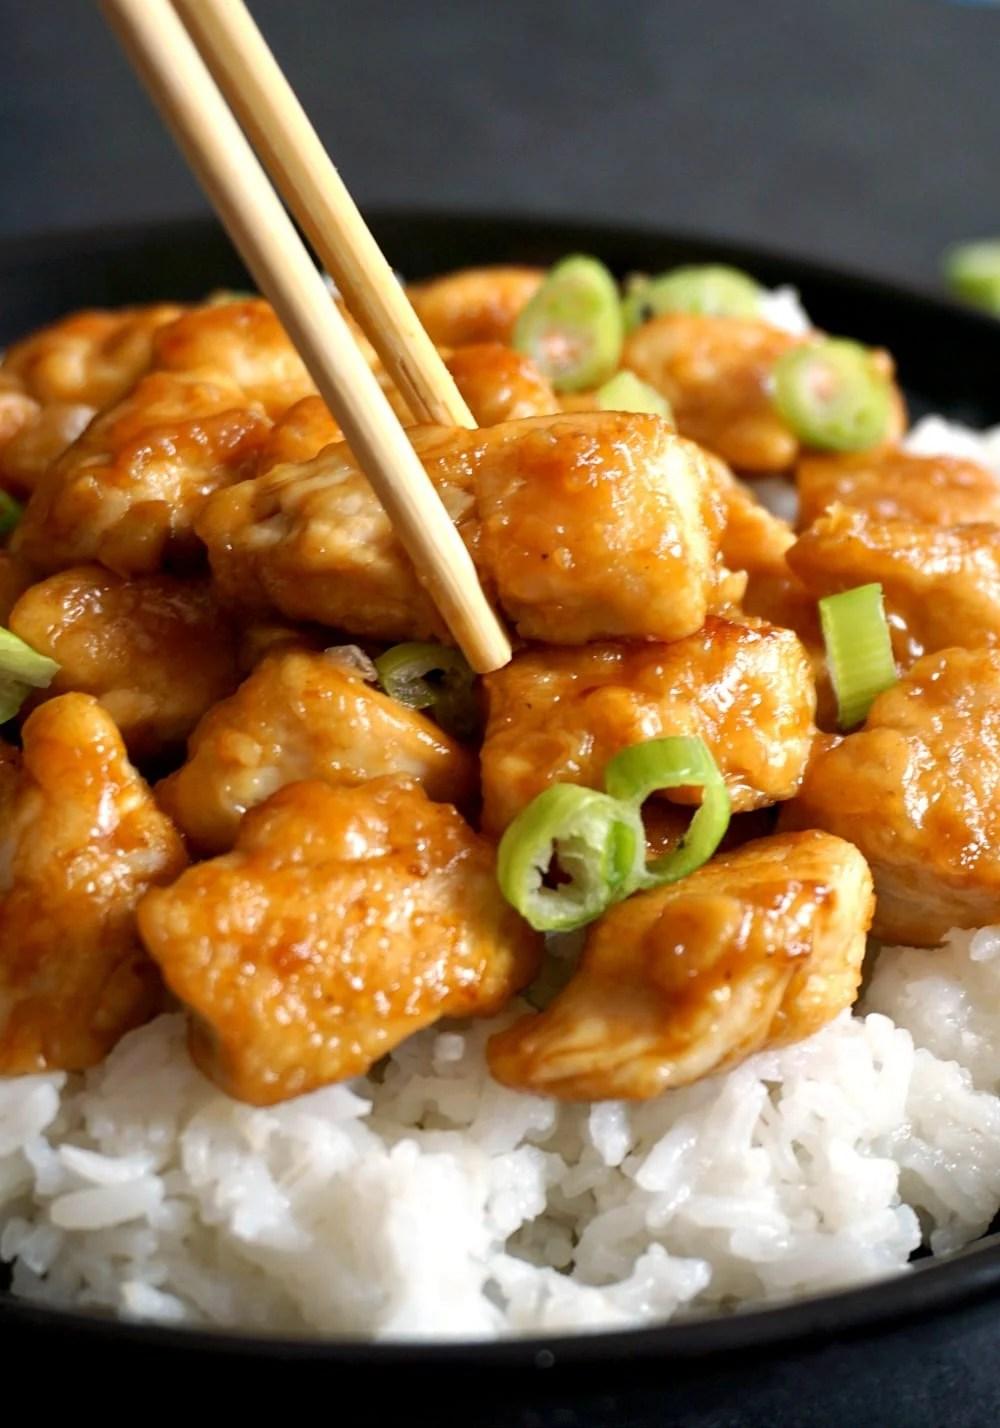 Easy Orange Chicken Recipe - My Gorgeous Recipes